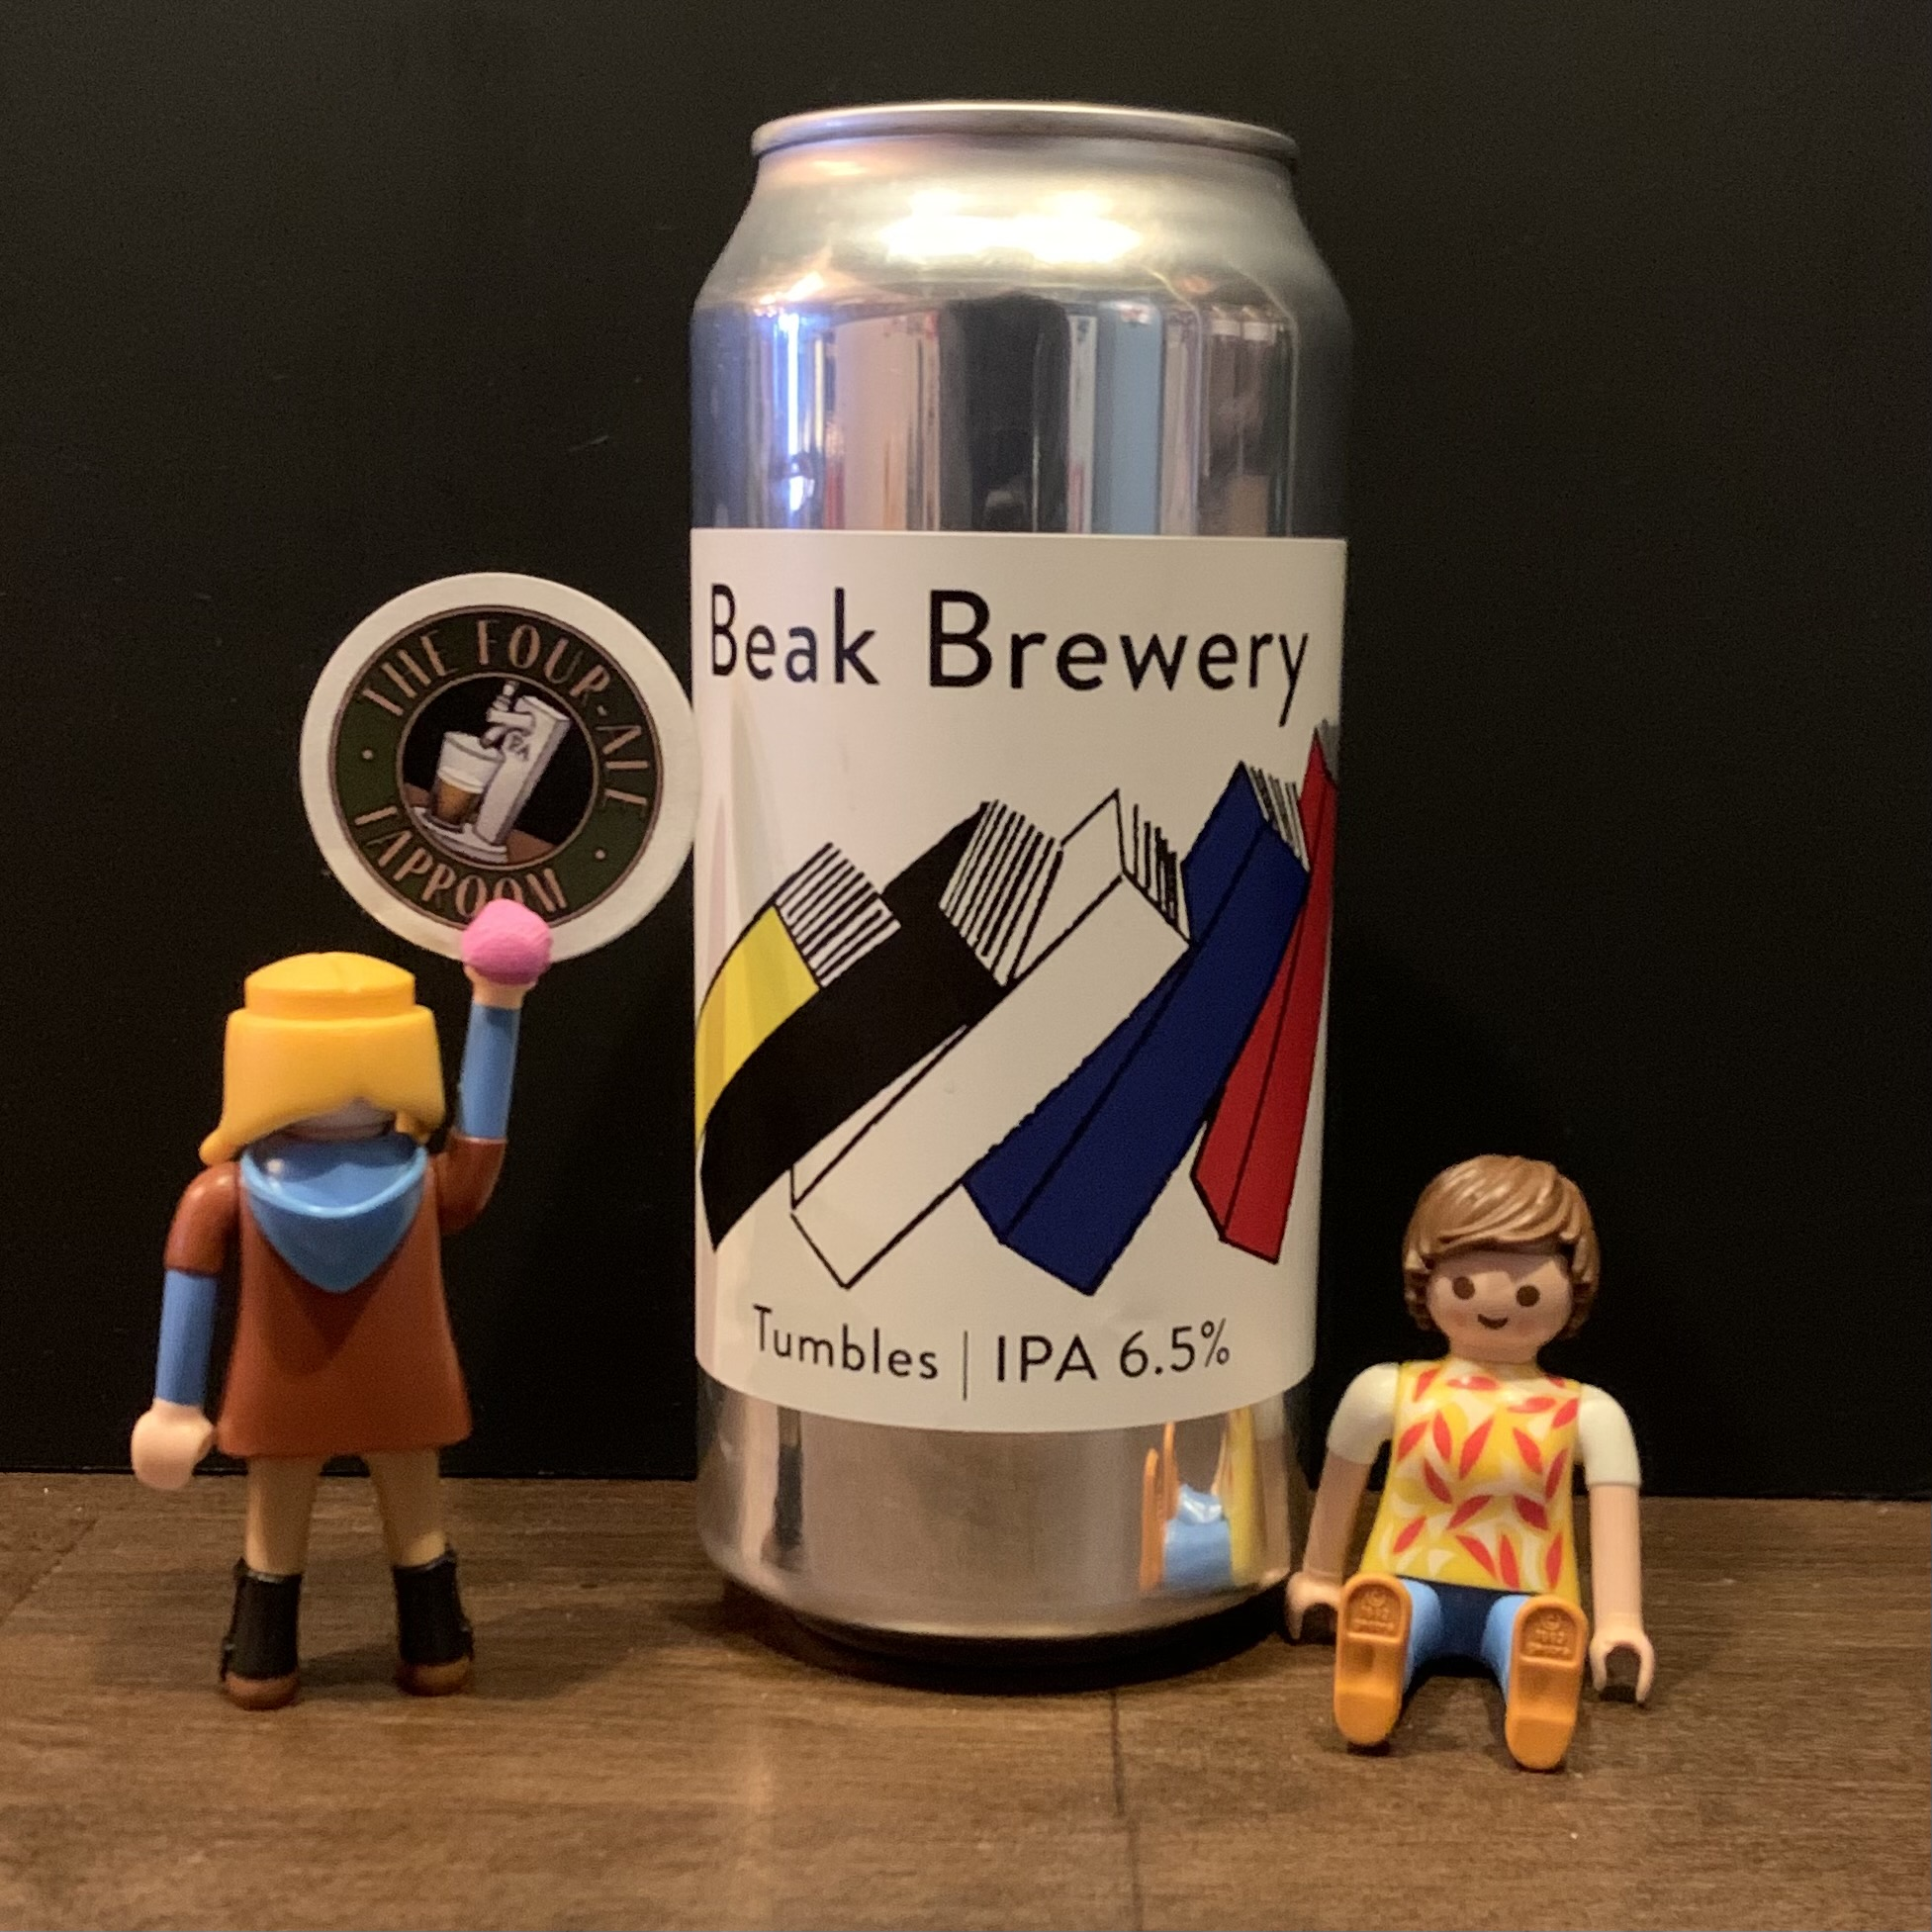 Beak Brewery - Tumbles IPA - New England - 6.5%